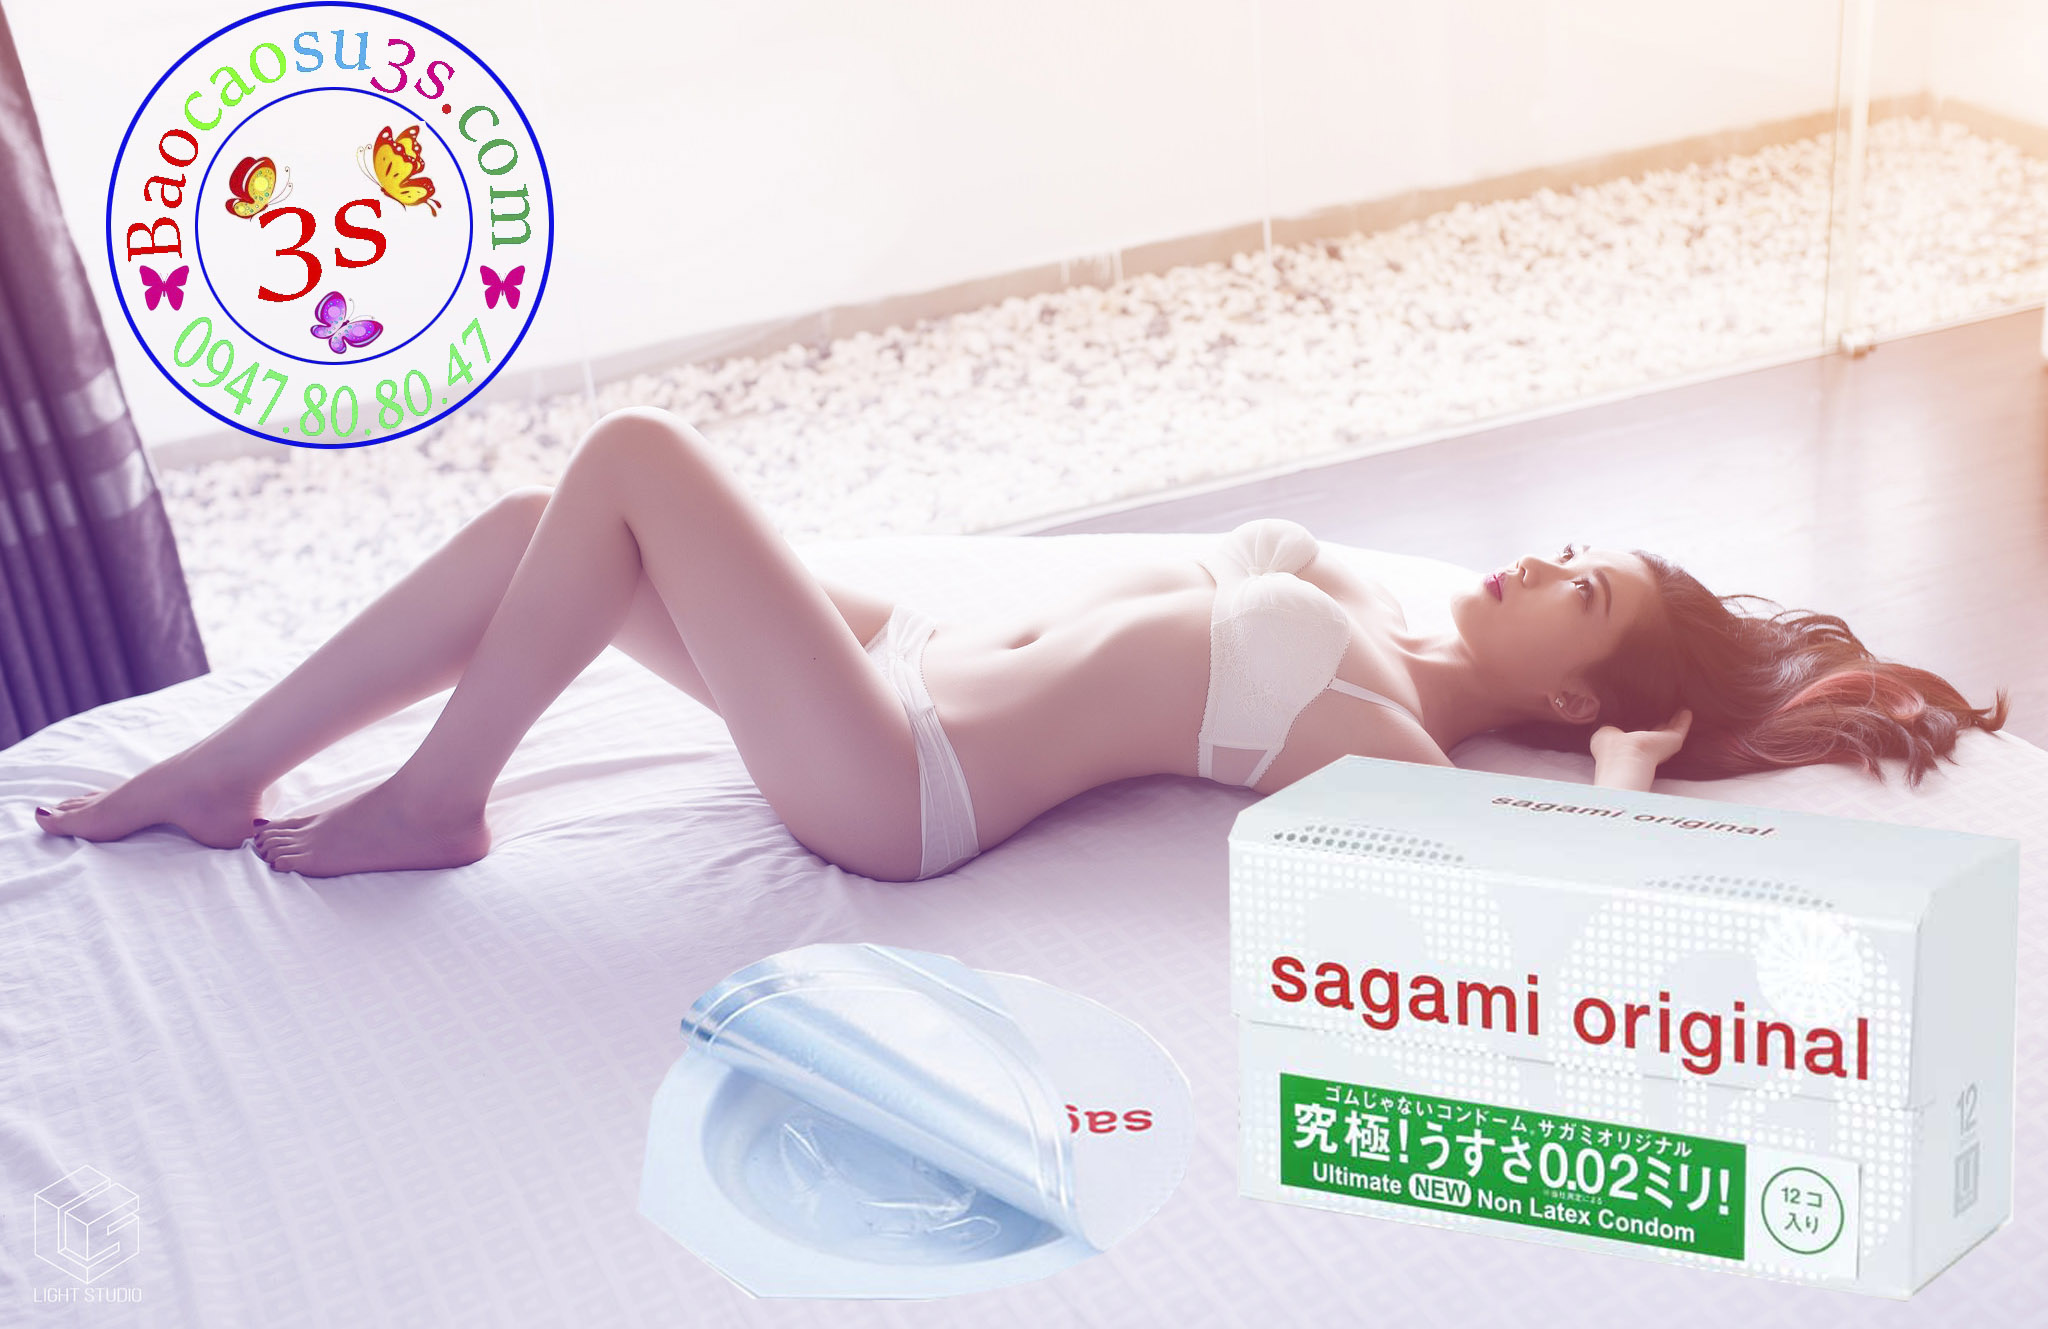 Bao cao su siêu mỏng chống dị ứng sagami original 0.02